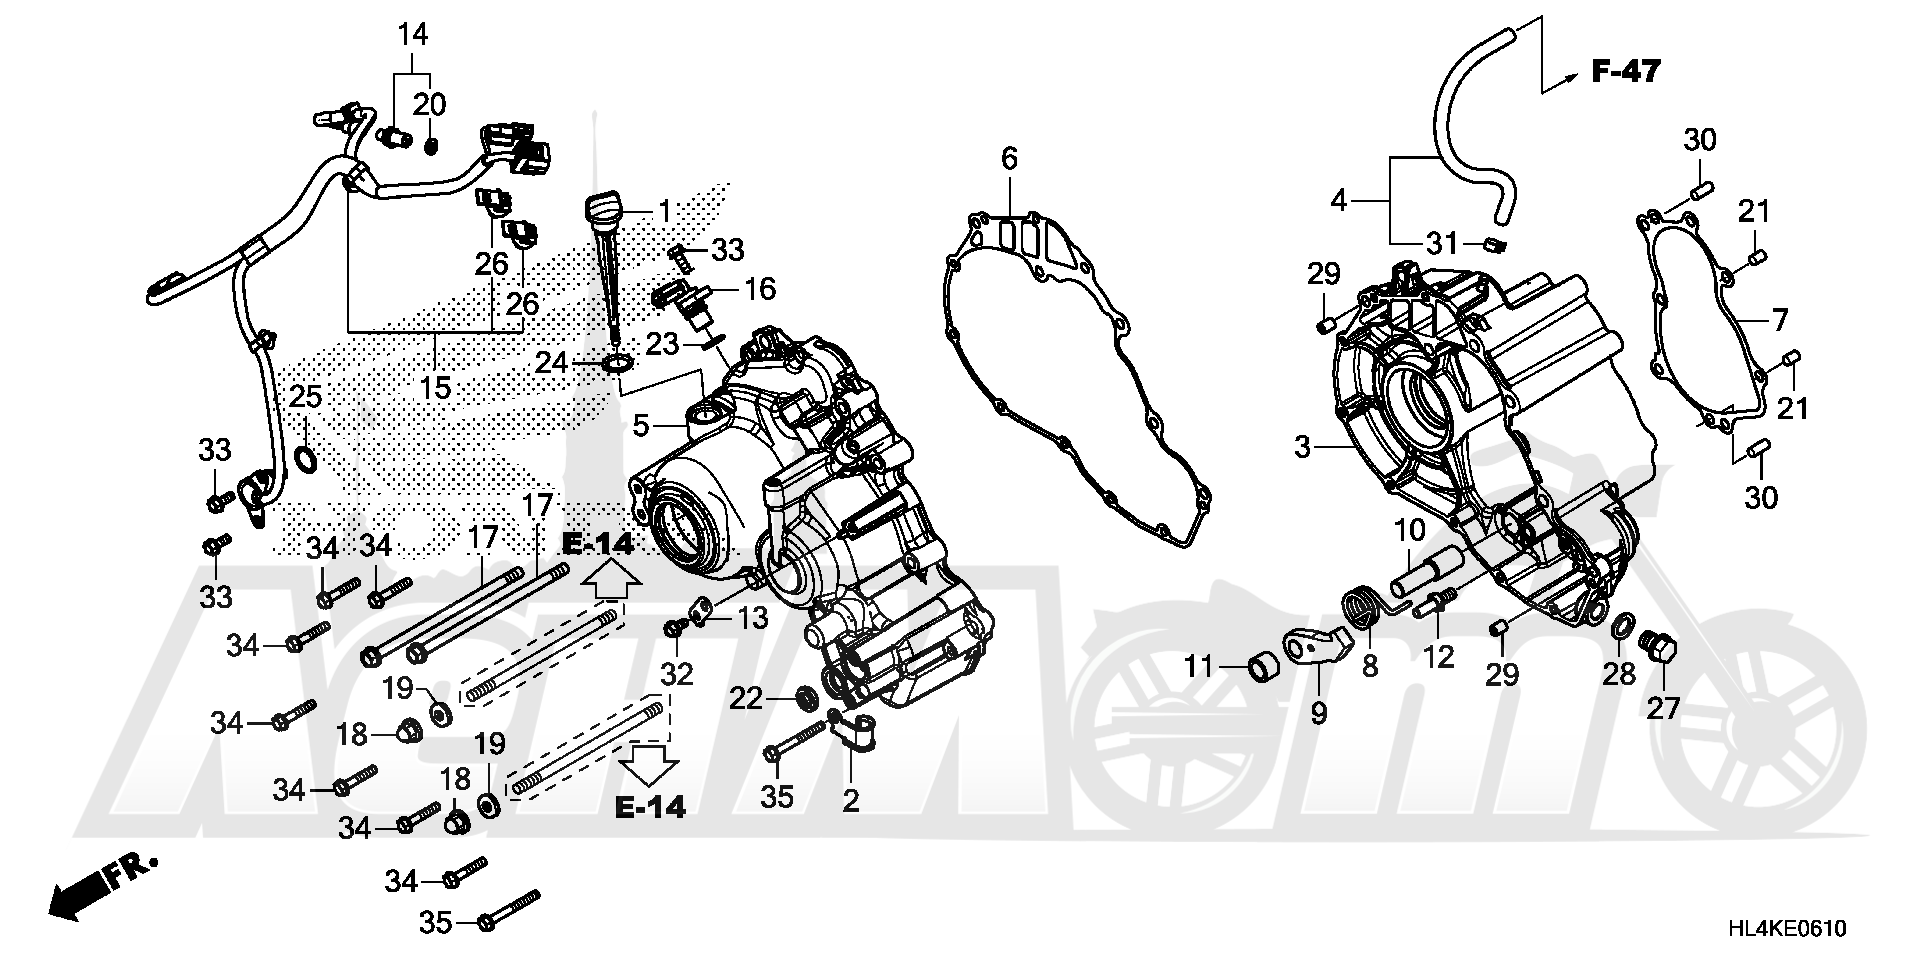 Запчасти для Квадроцикла Honda 2019 SXS1000M3L Раздел: SUB-TRANSMISSION CASE   SUB трансмиссия корпус